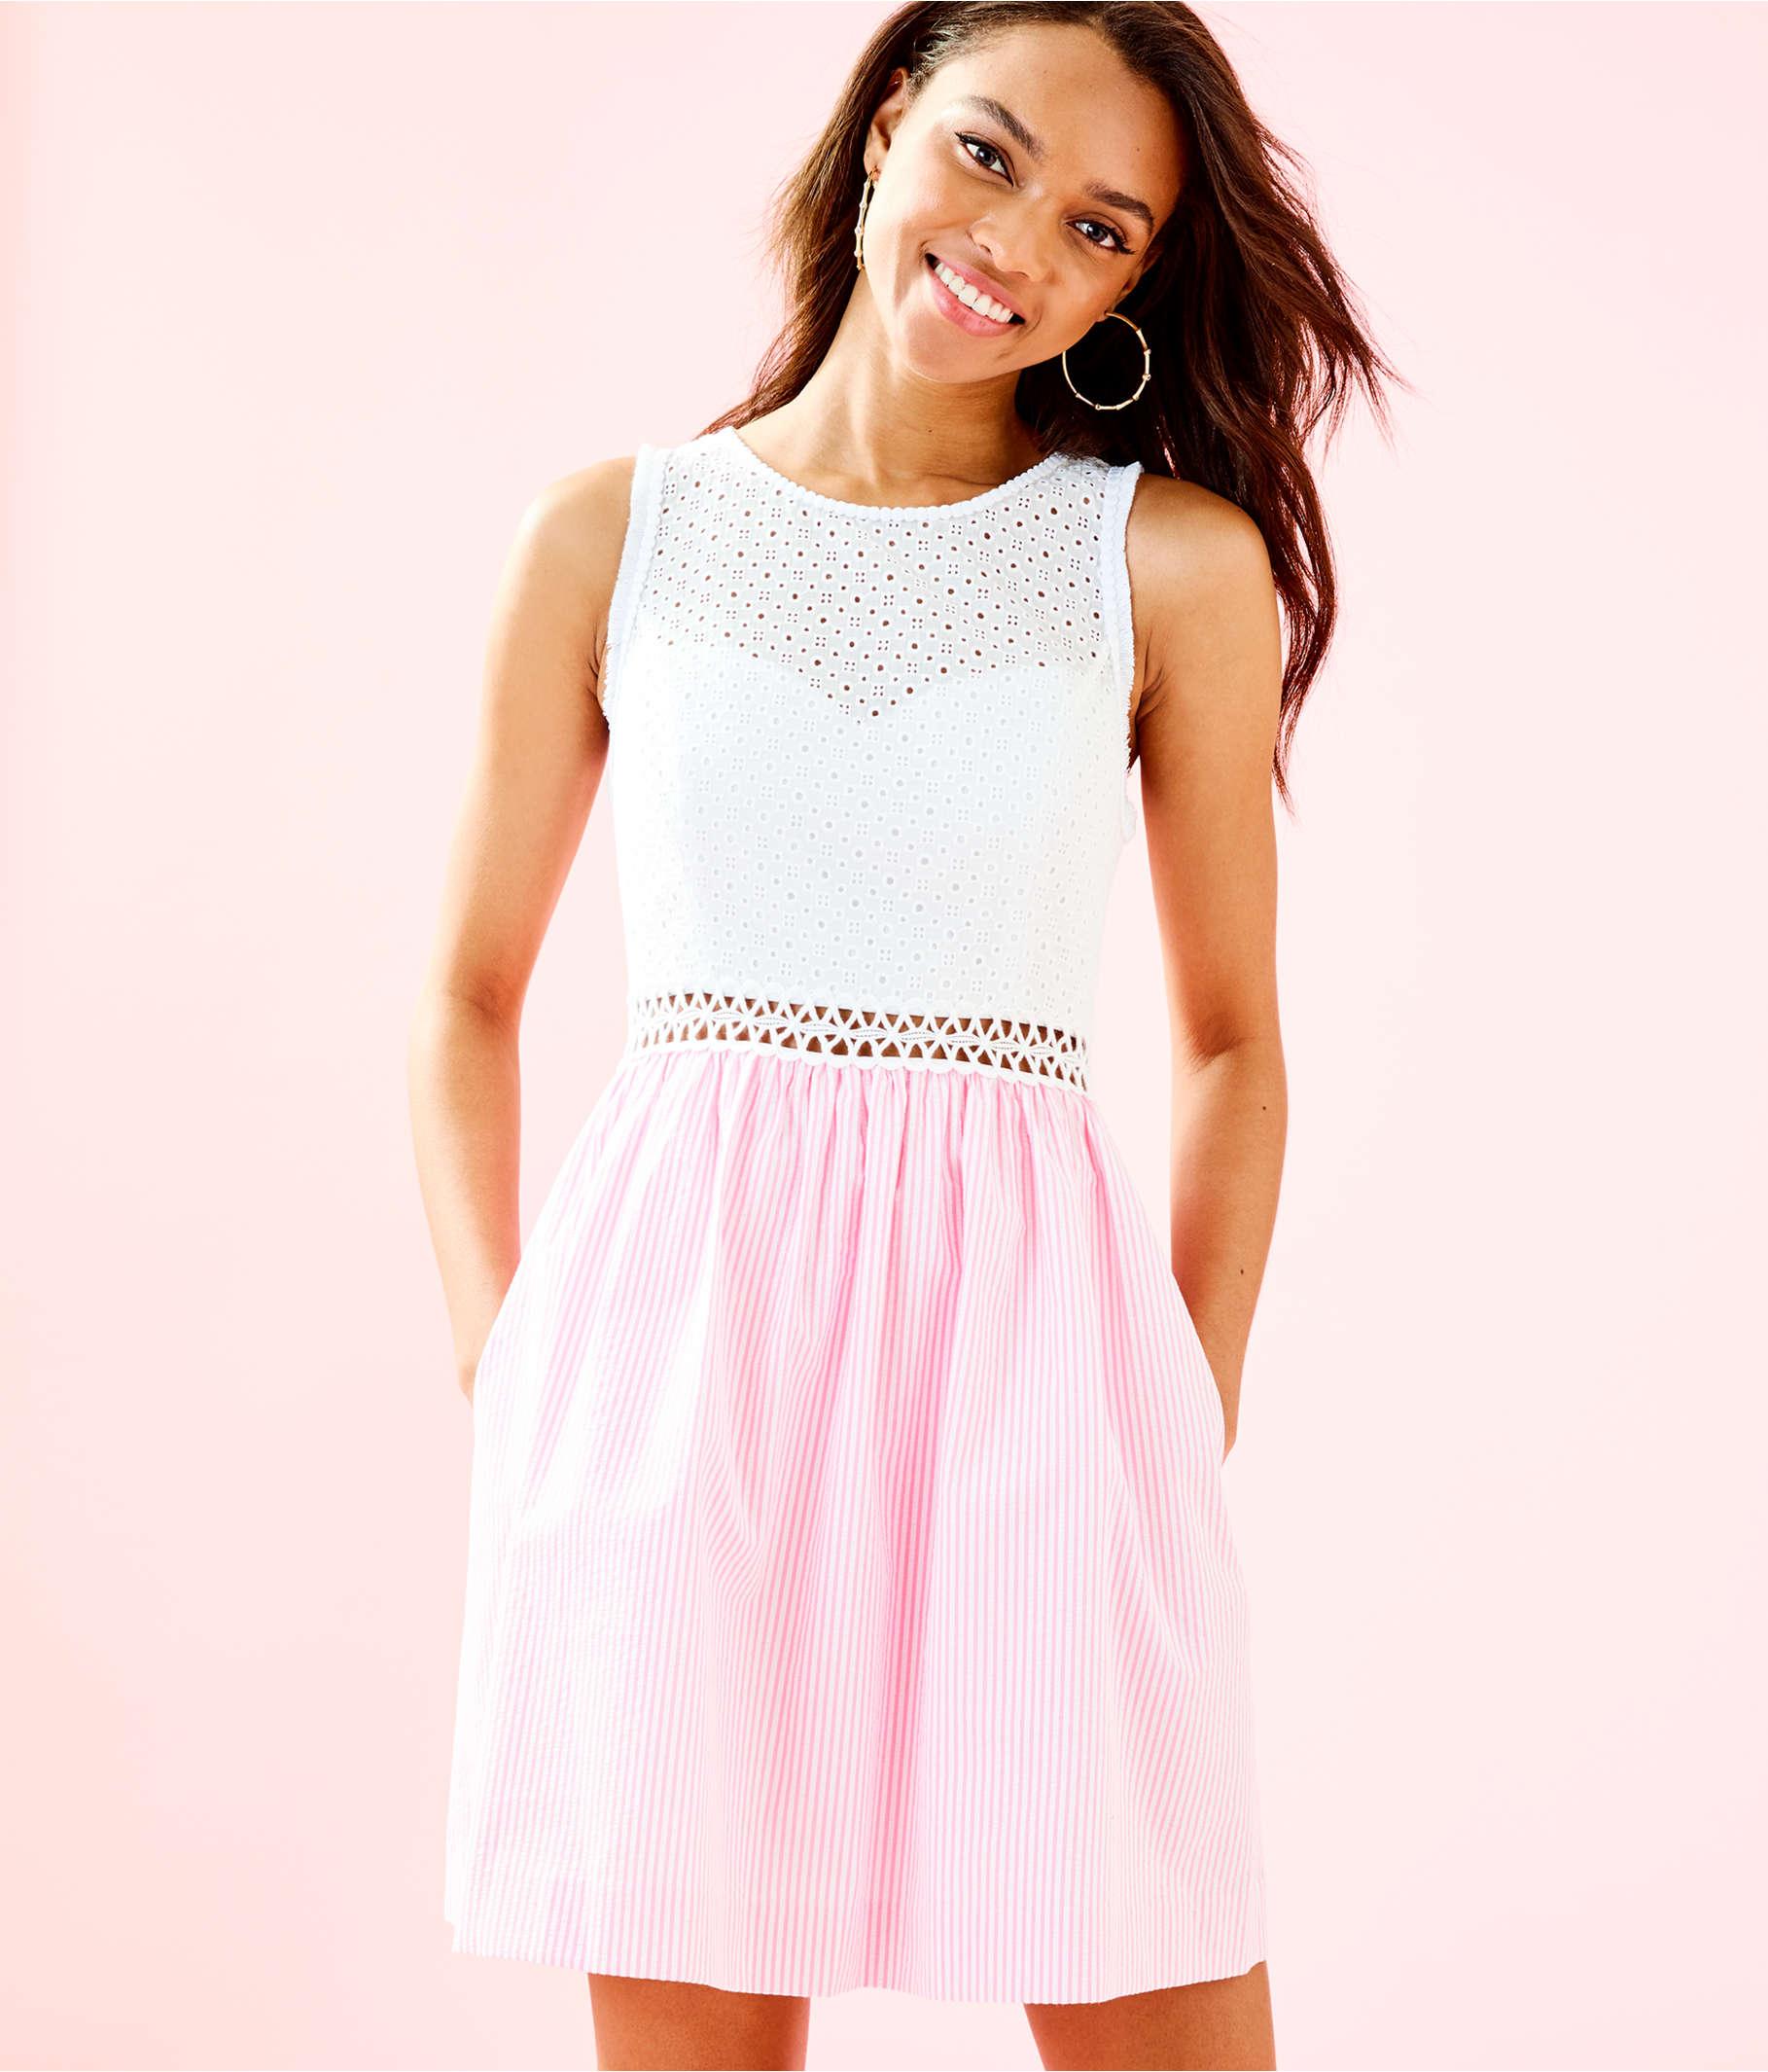 Lilly Pulitzer Alivia Dress